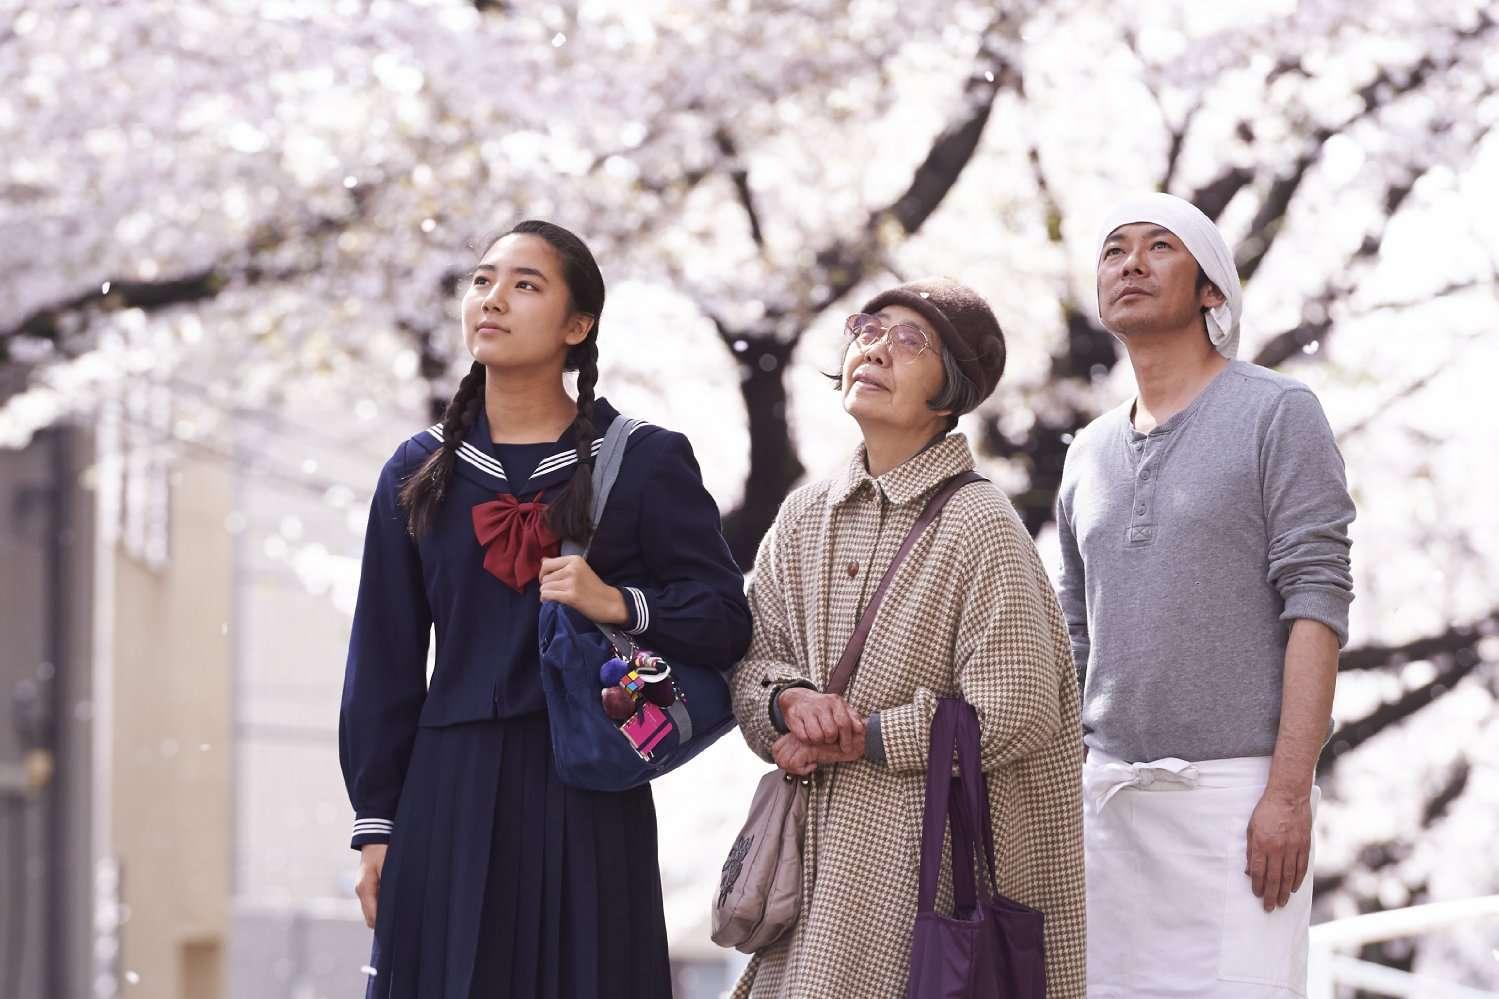 Kirsikkapuiden alla press foto matkaelokuva